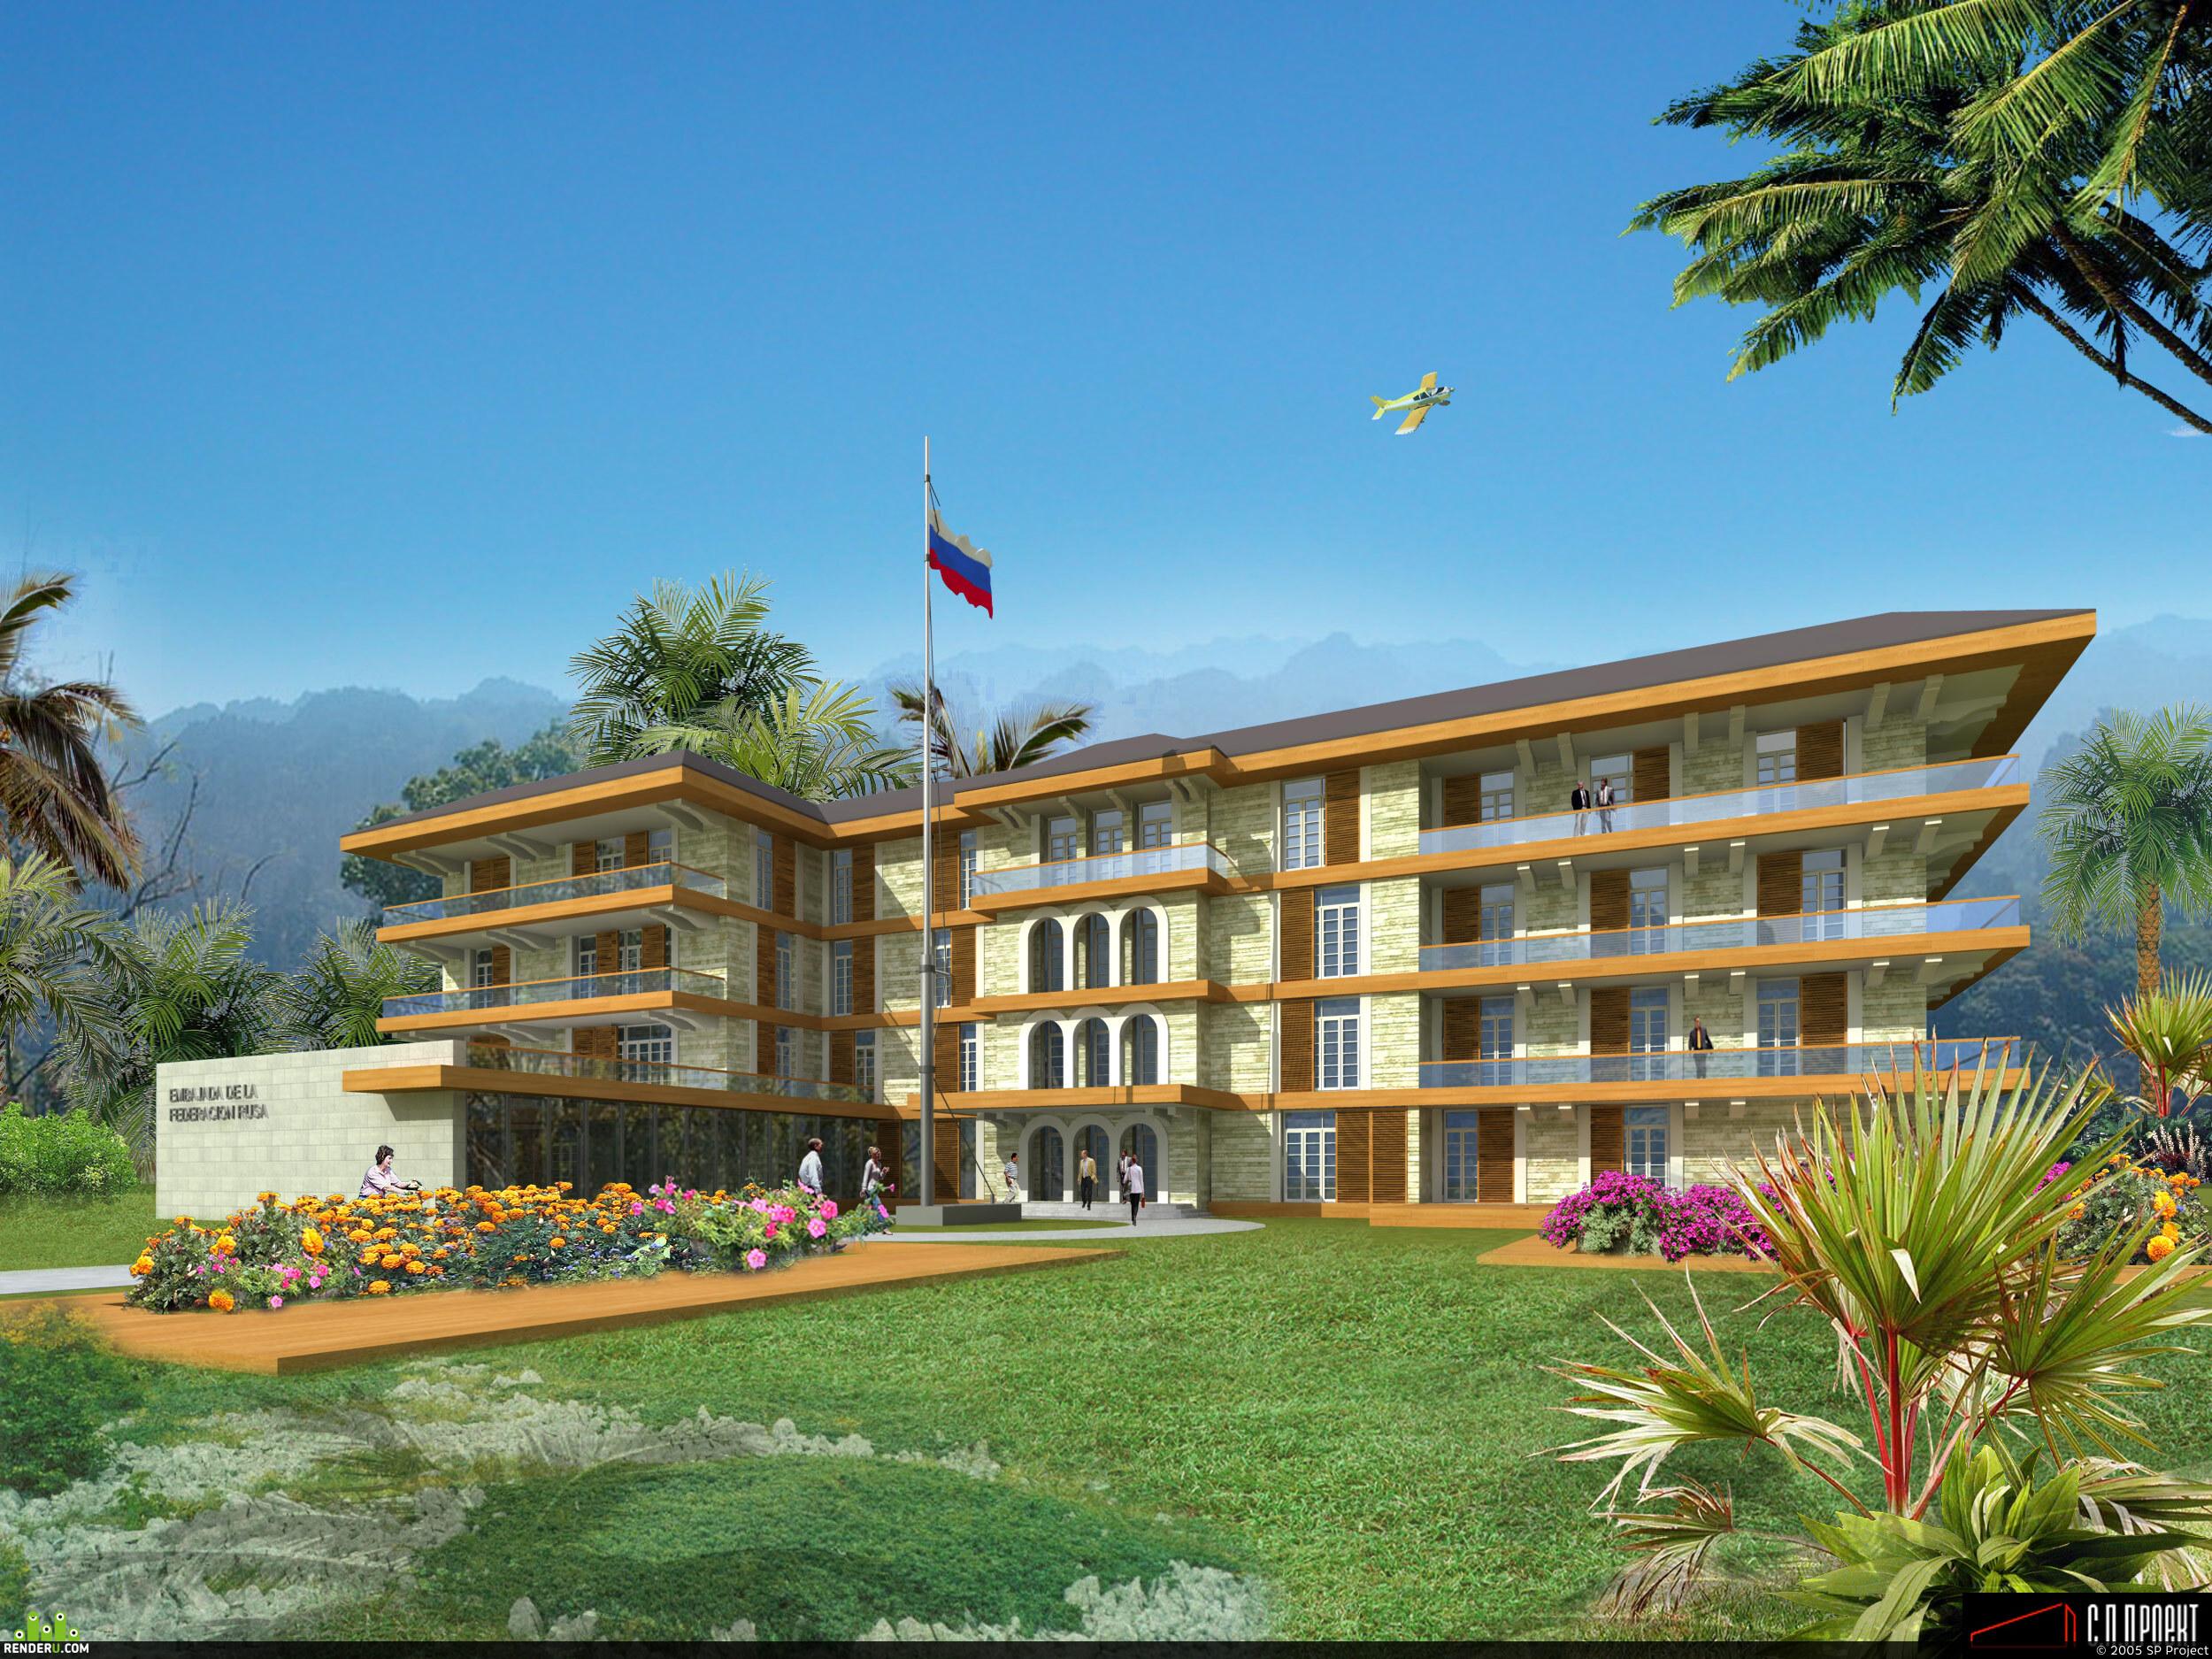 preview Визуализация предложения на проектирование посольства РФ в Панаме